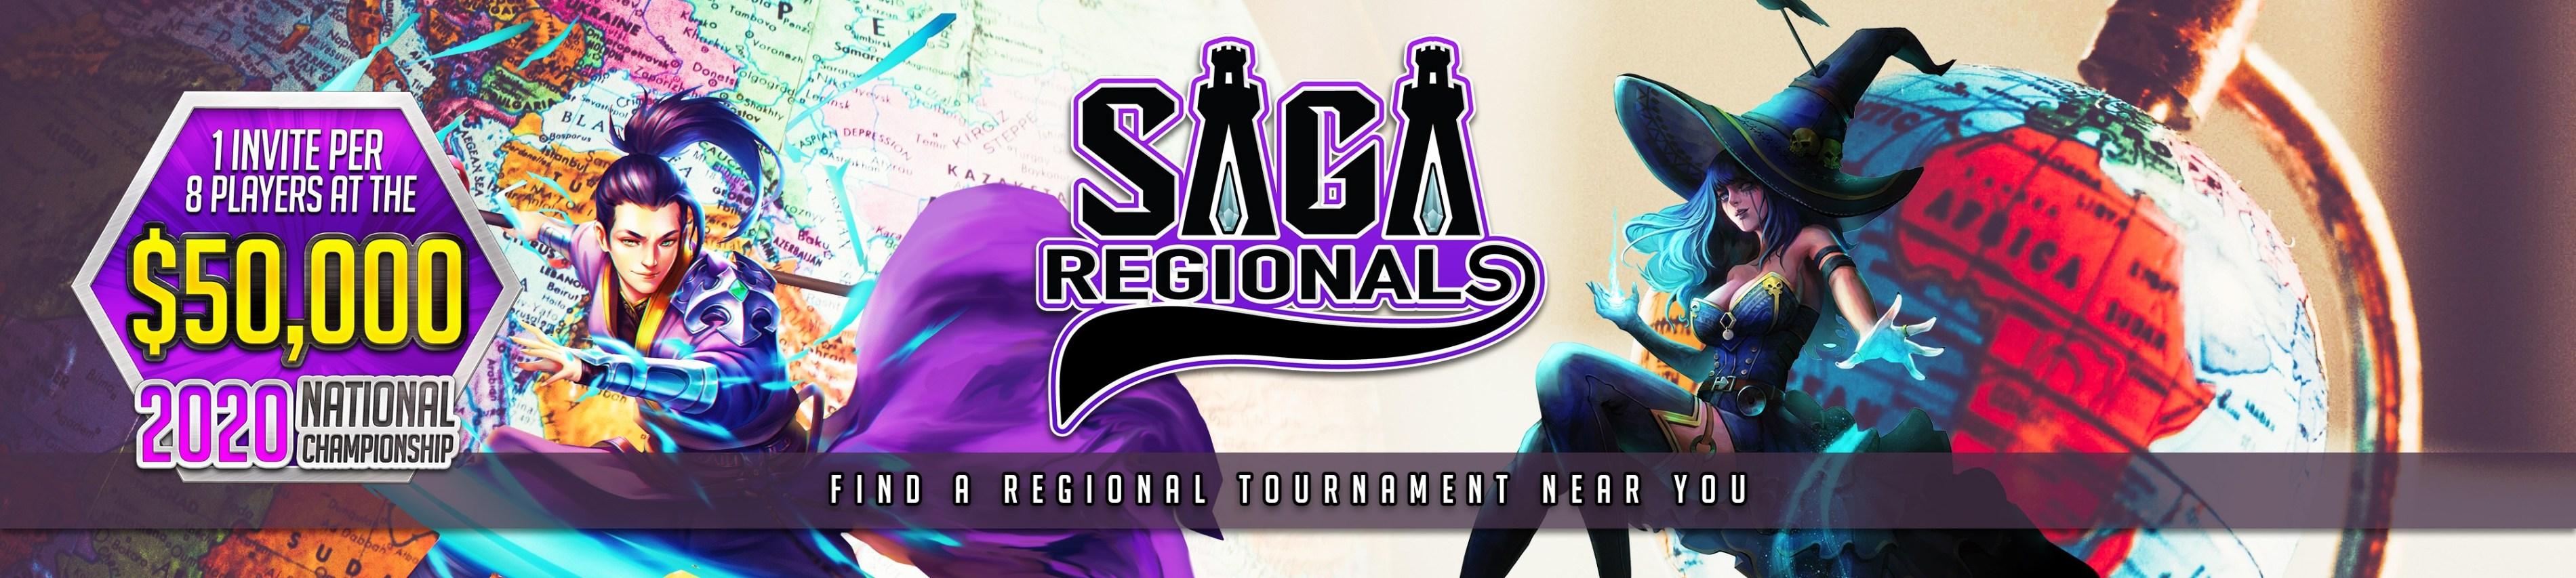 Argent Saga Regionals - October 19, 2019